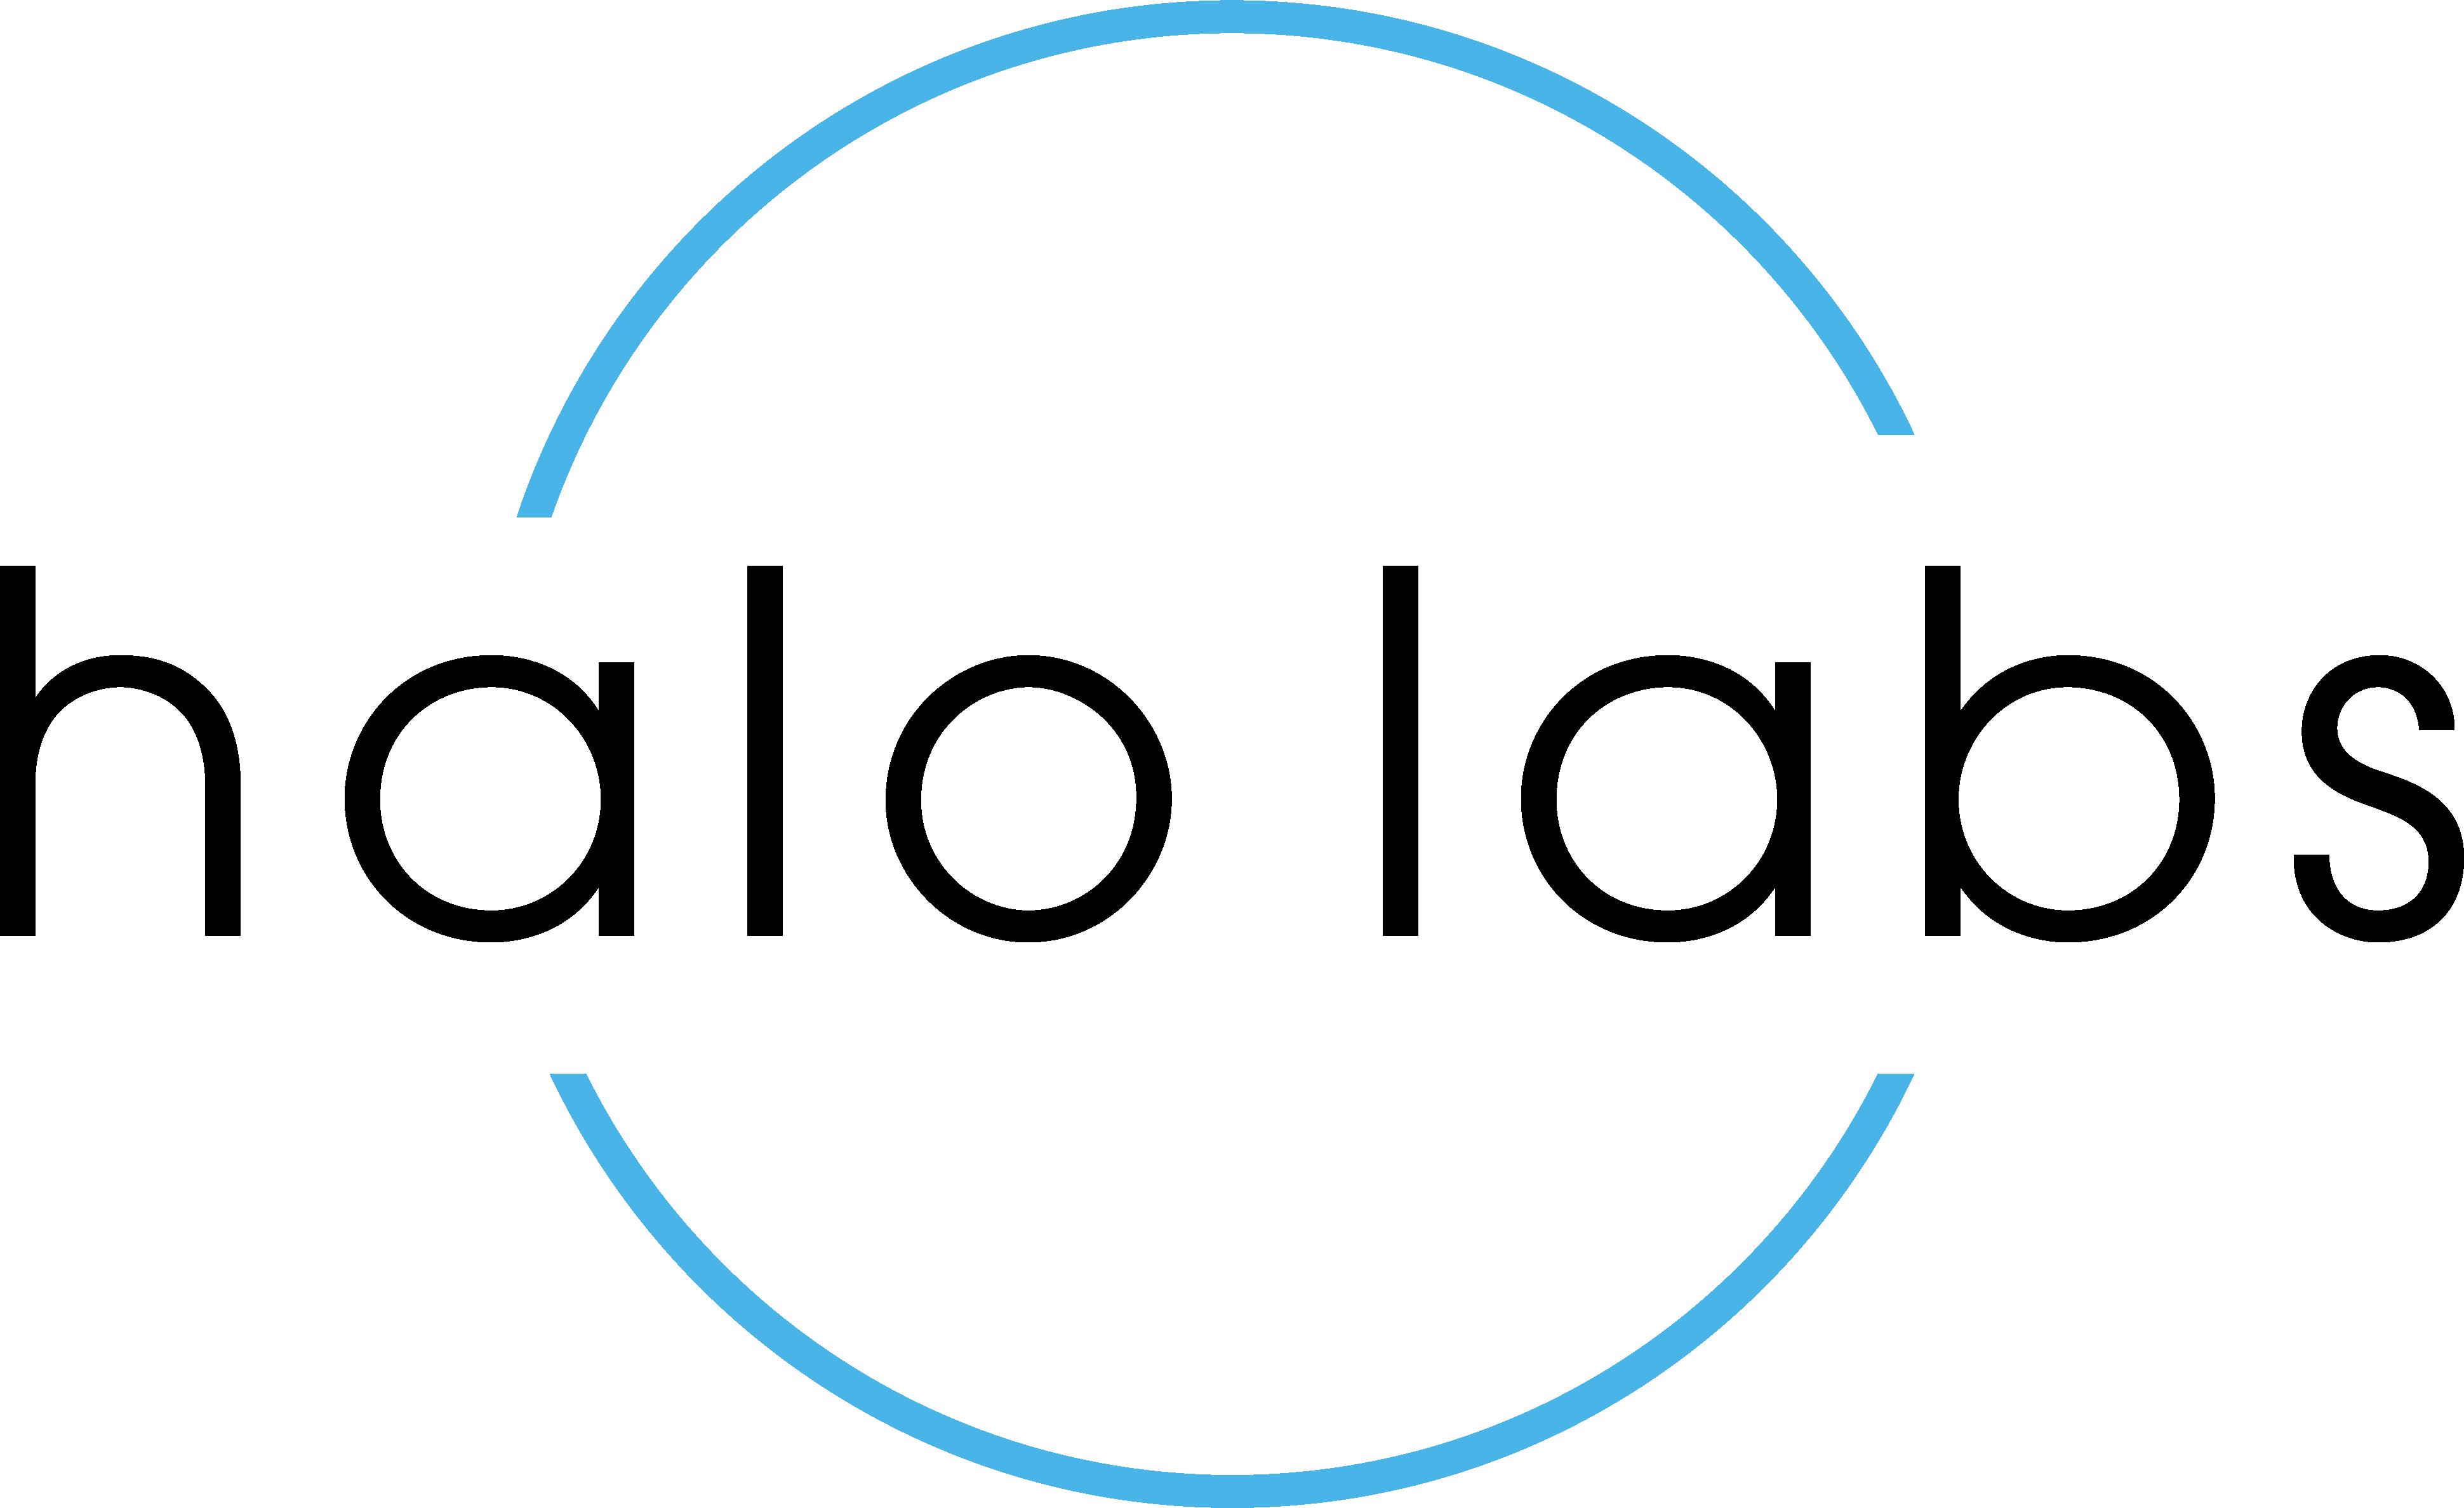 HL logo_3881x2375